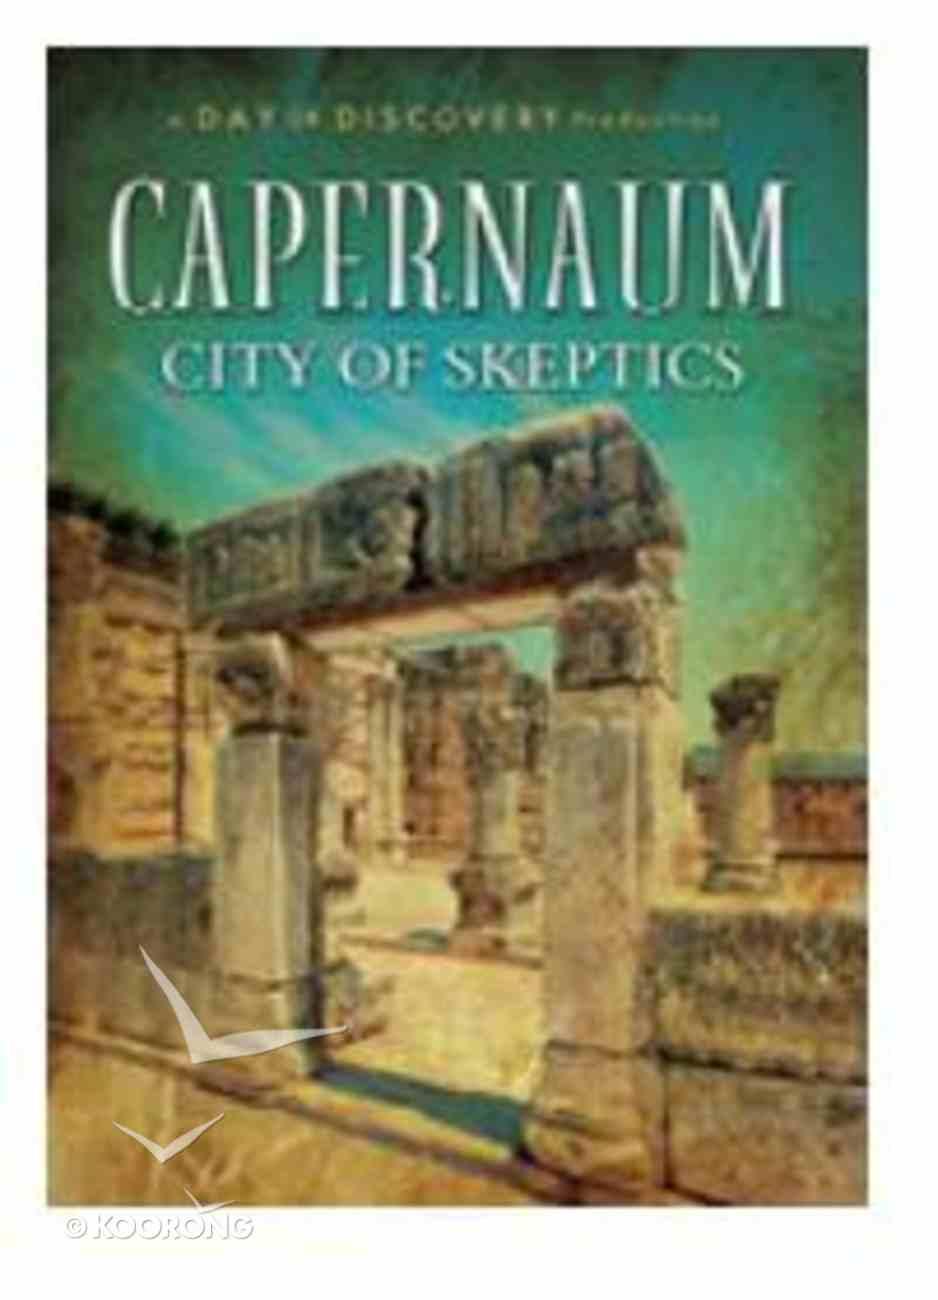 Capernaum: City of Skeptics DVD